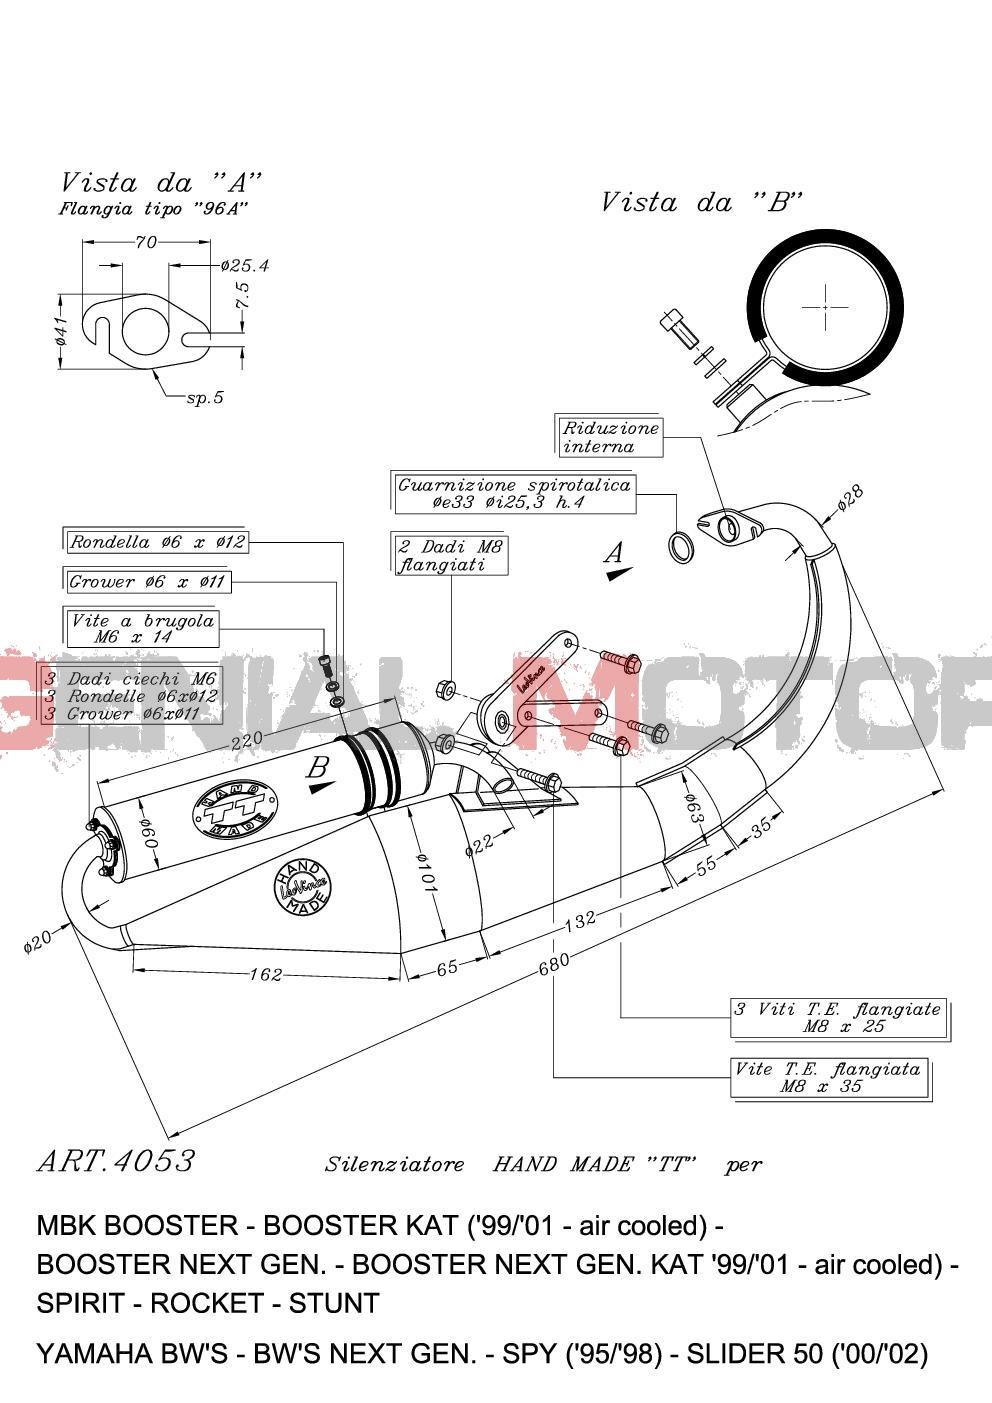 4053 Pot D'Echappement Complete Leovince Hand Made Tt Alu Yamaha Slider 2000 > 2002